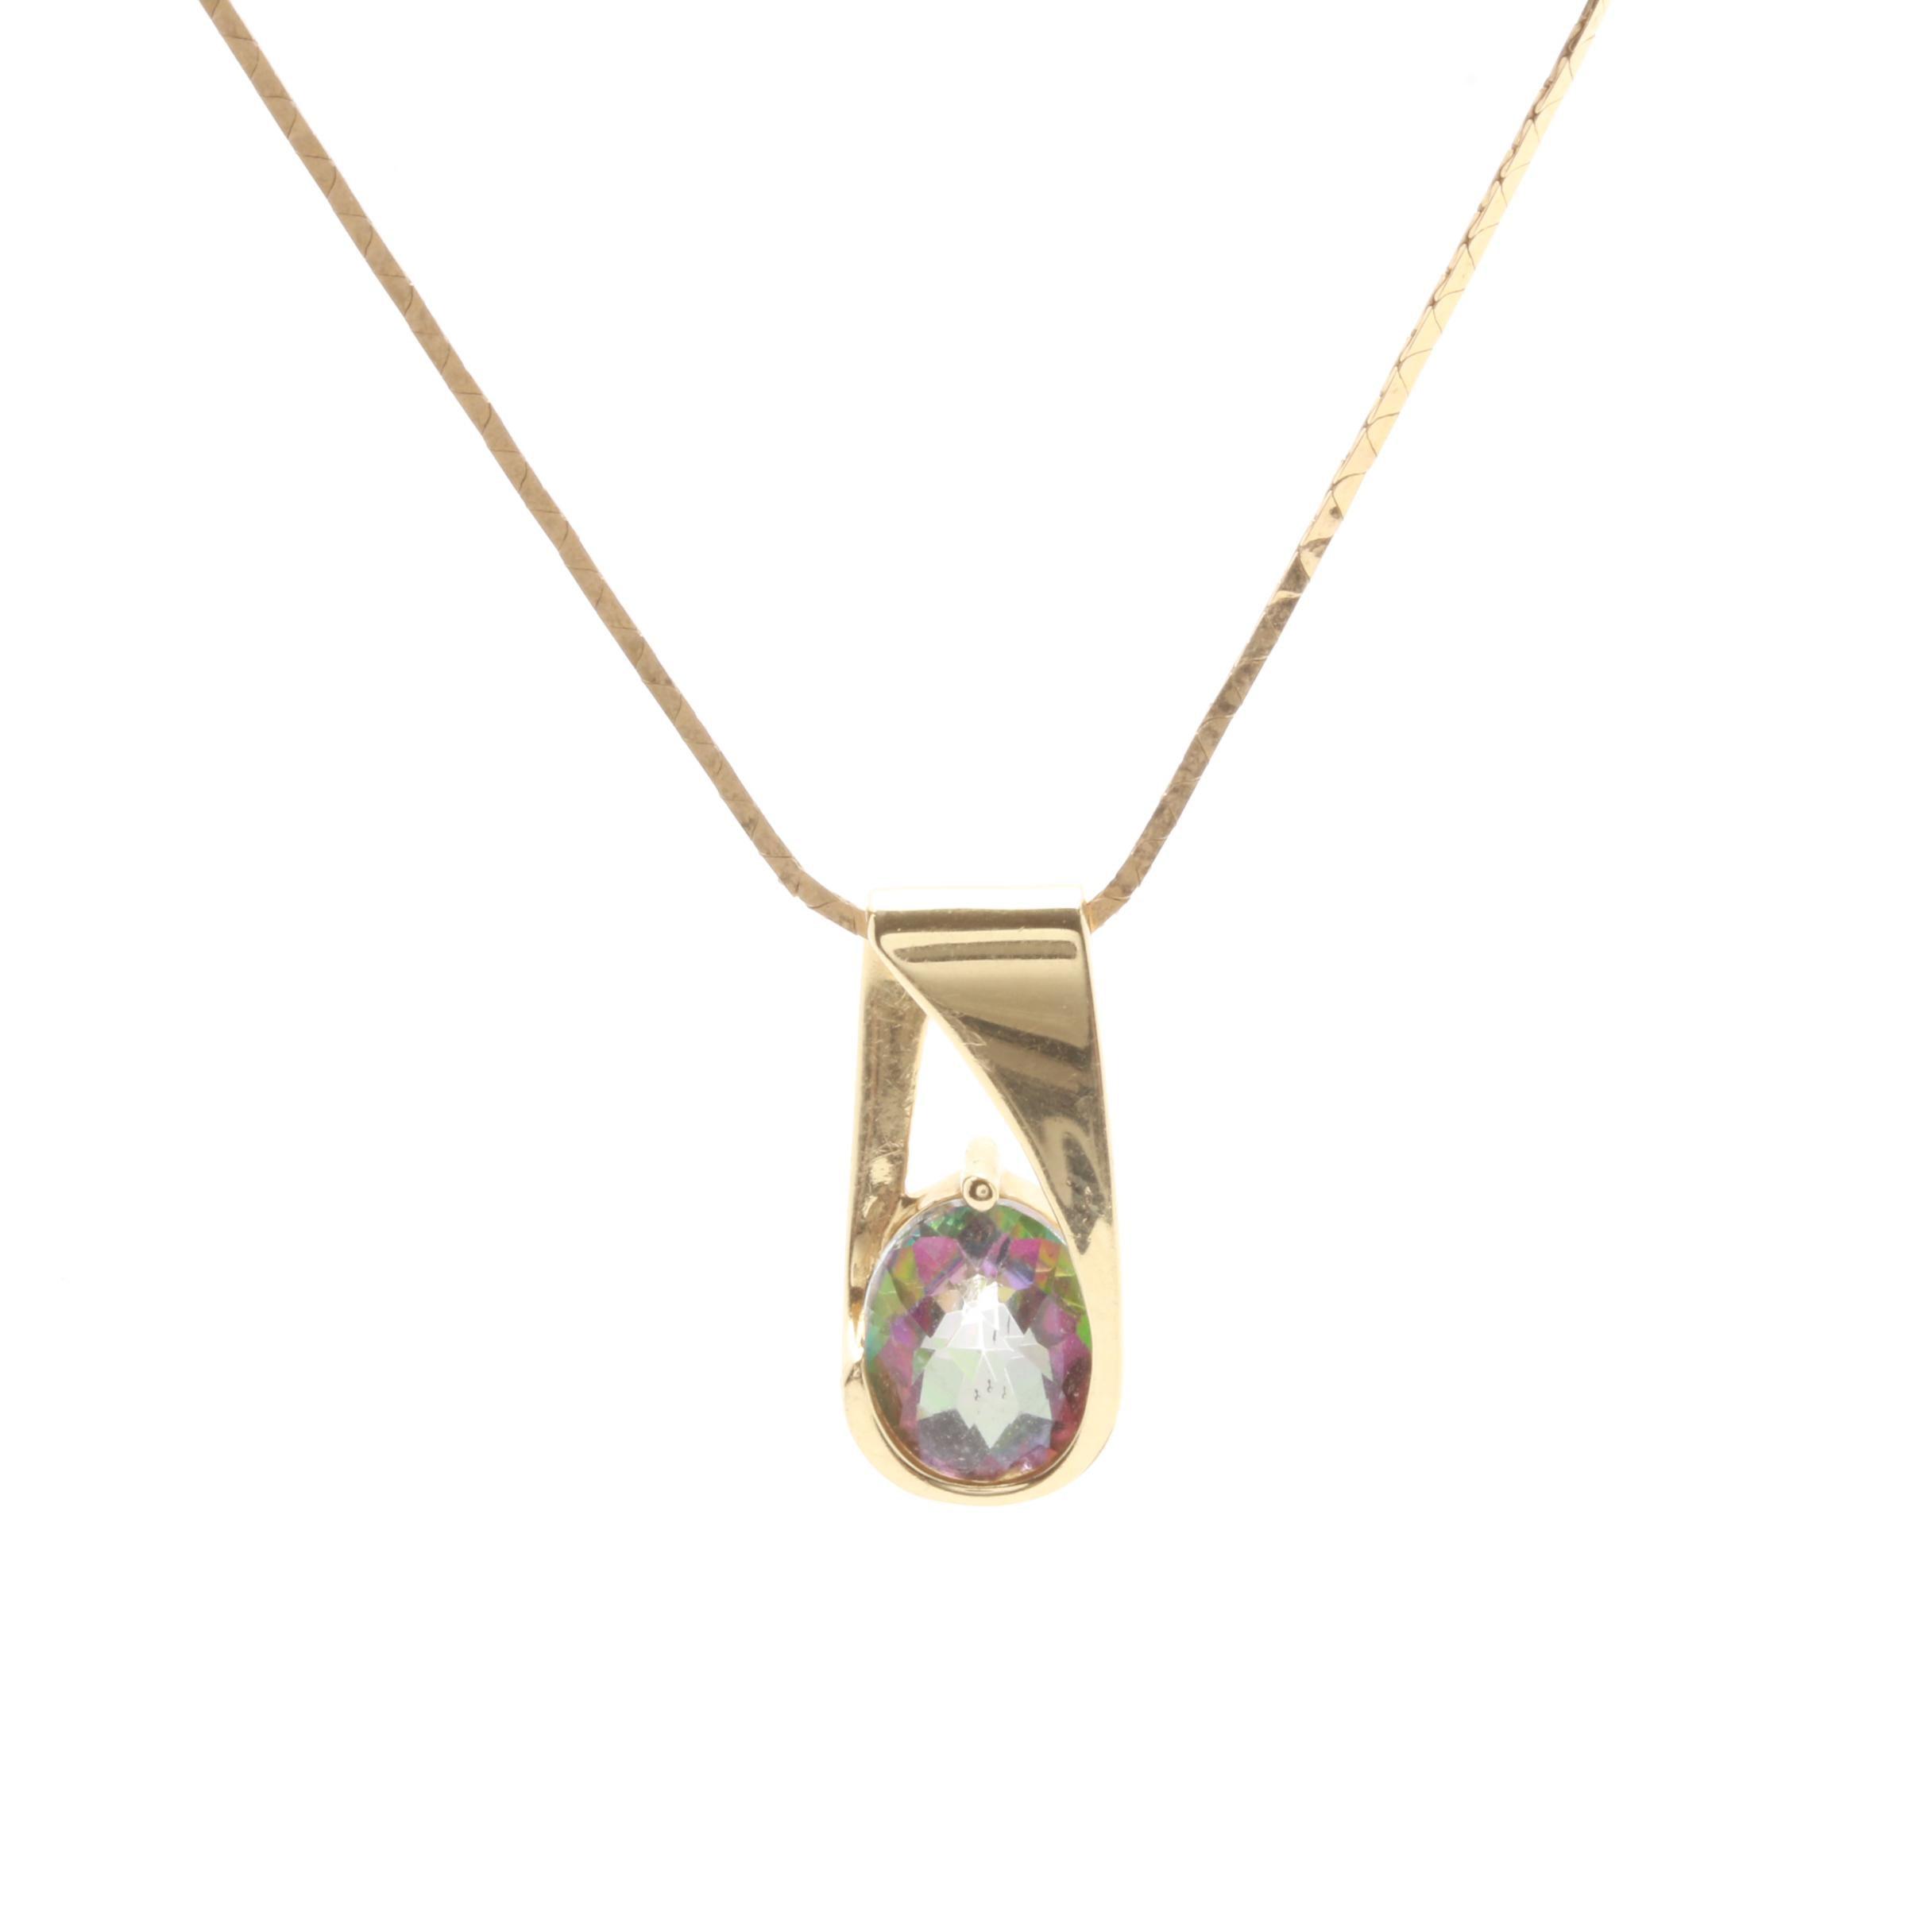 14K Yellow Gold Mystic Topaz Pendant Necklace